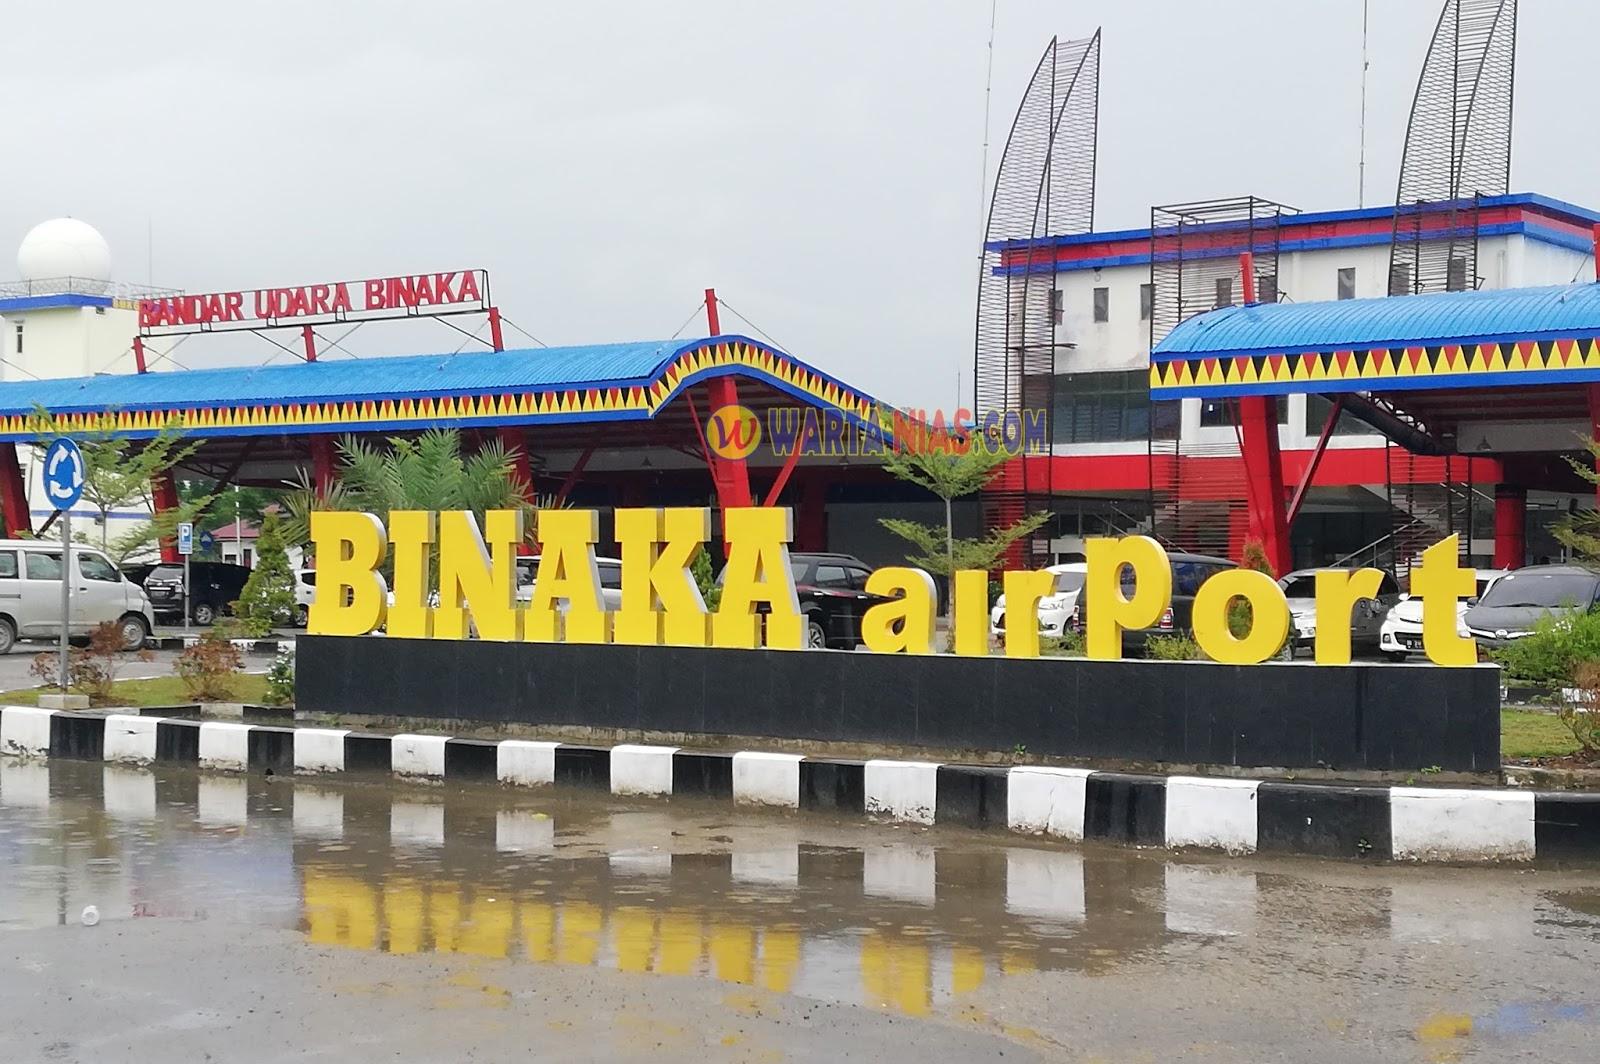 Hasil gambar untuk Bandara Binaka.